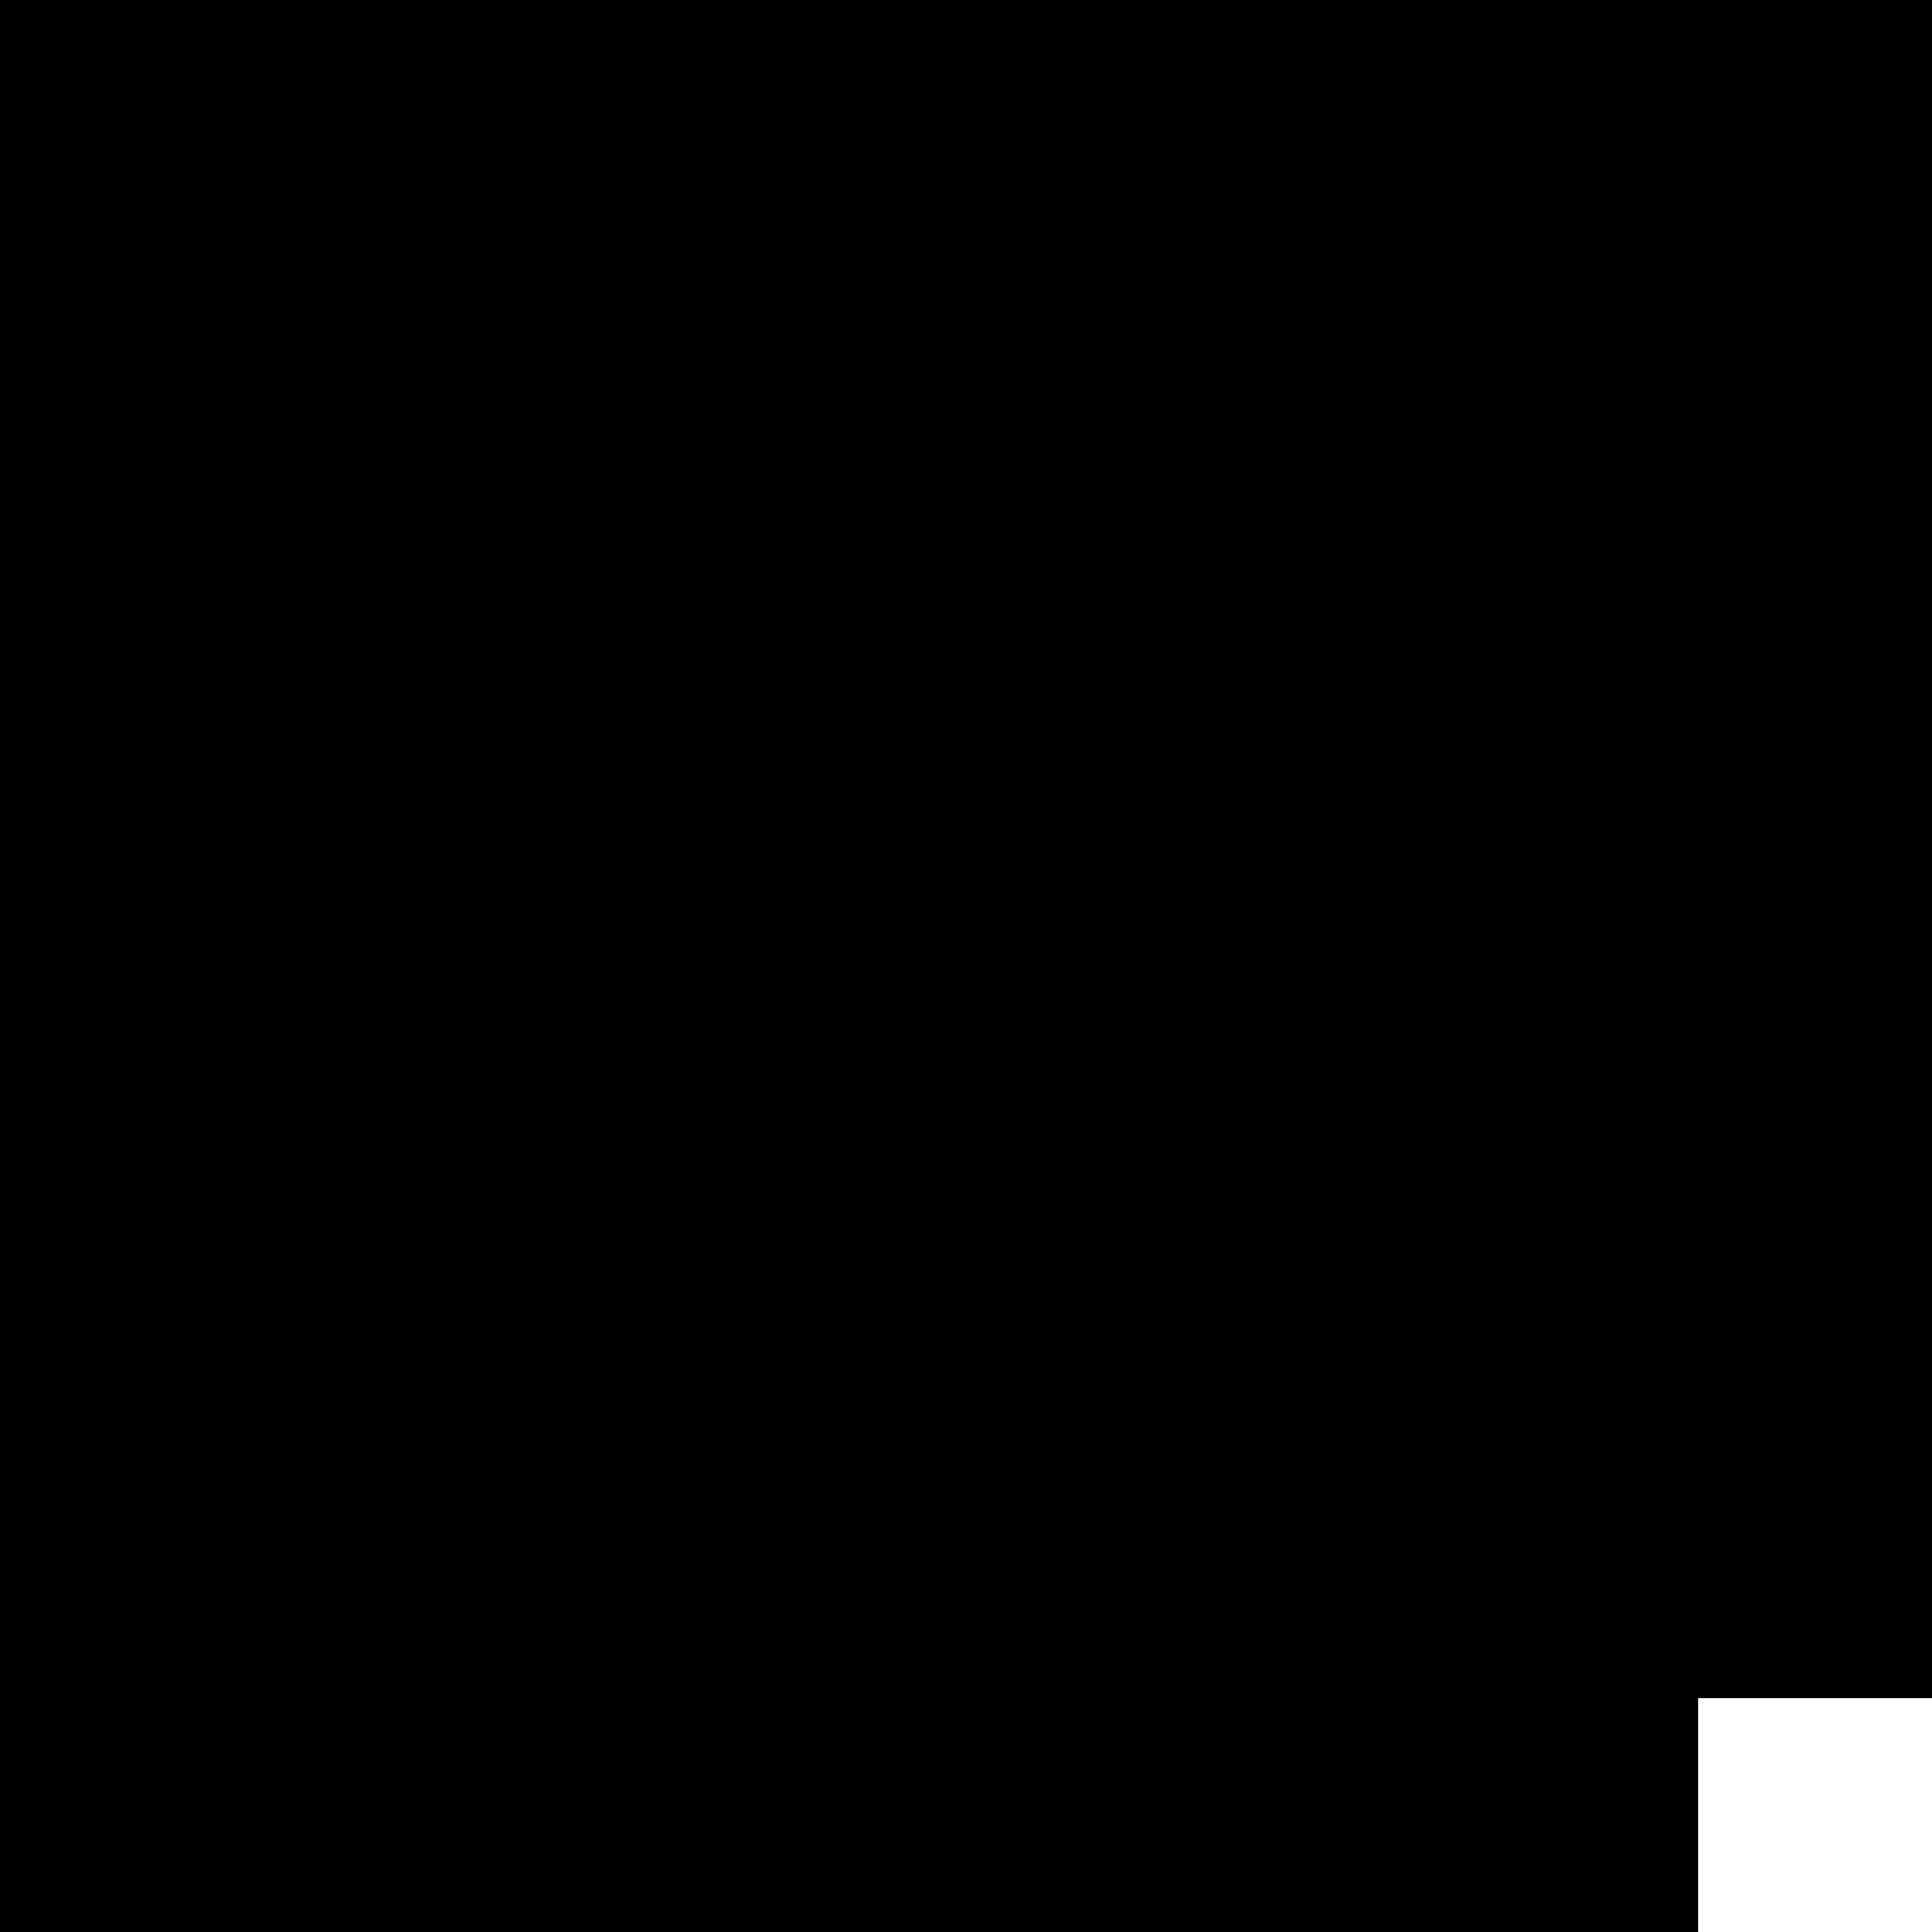 MG 3 manufacturer logo